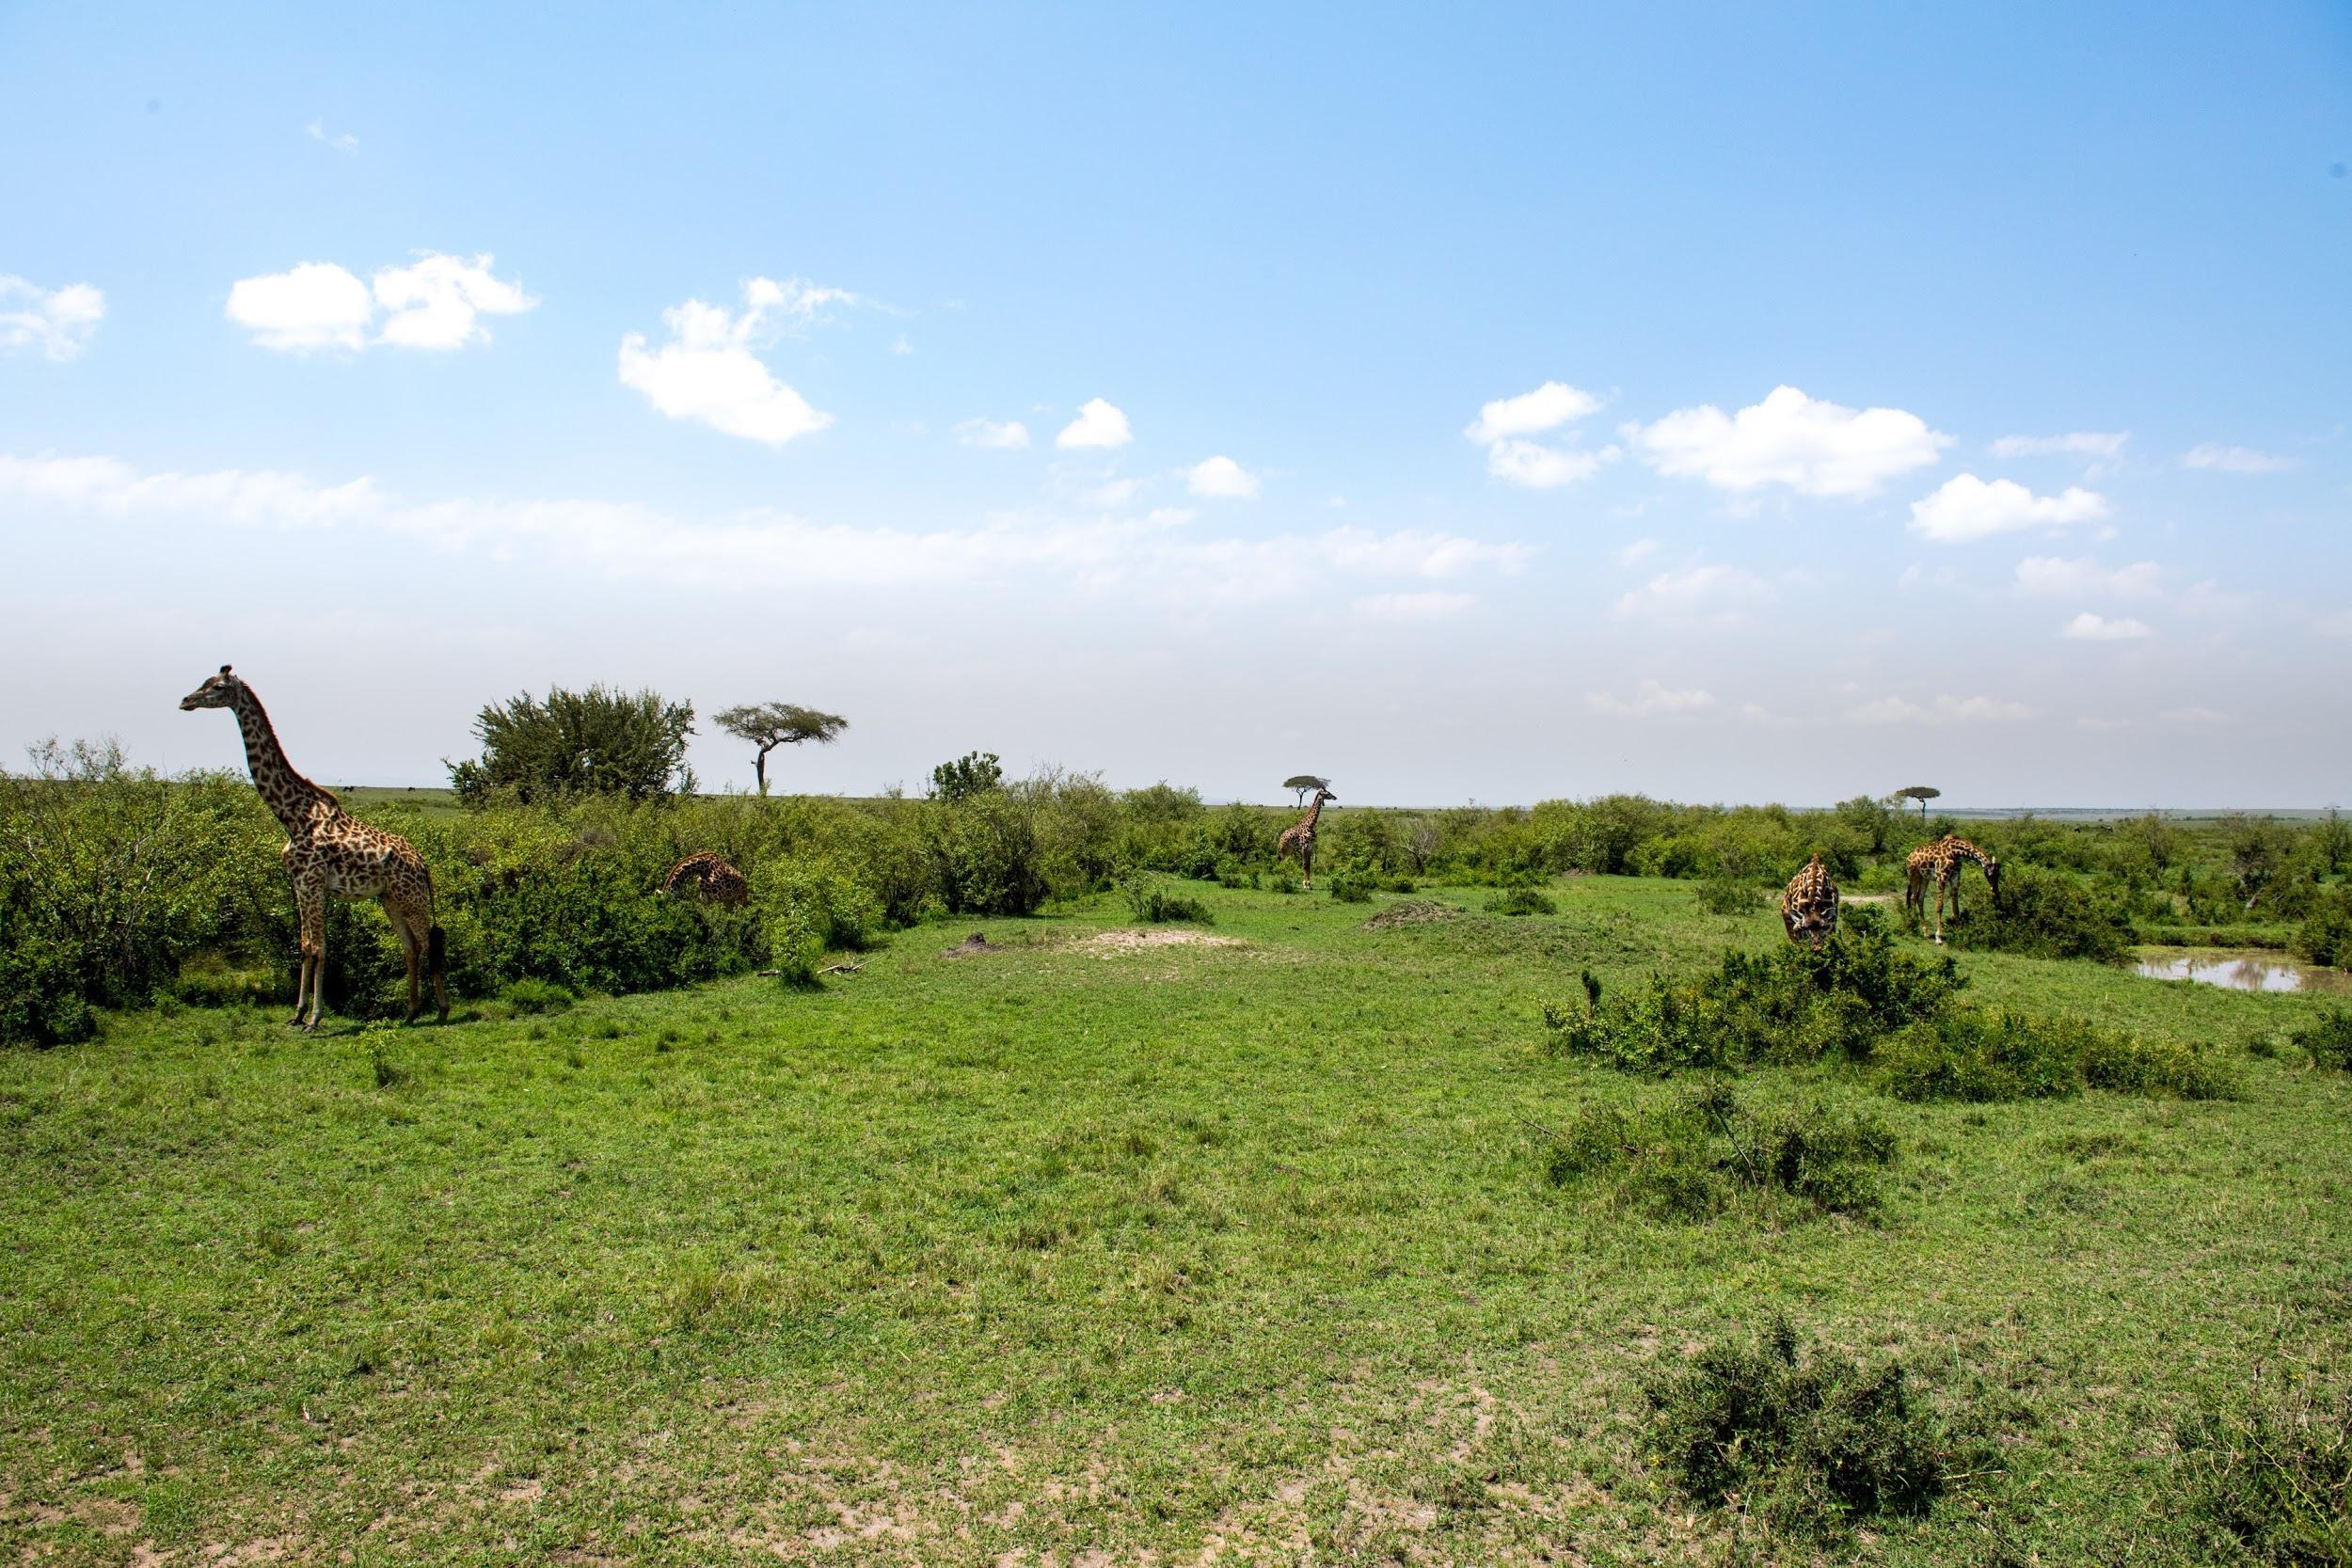 safari view landscape.jpg